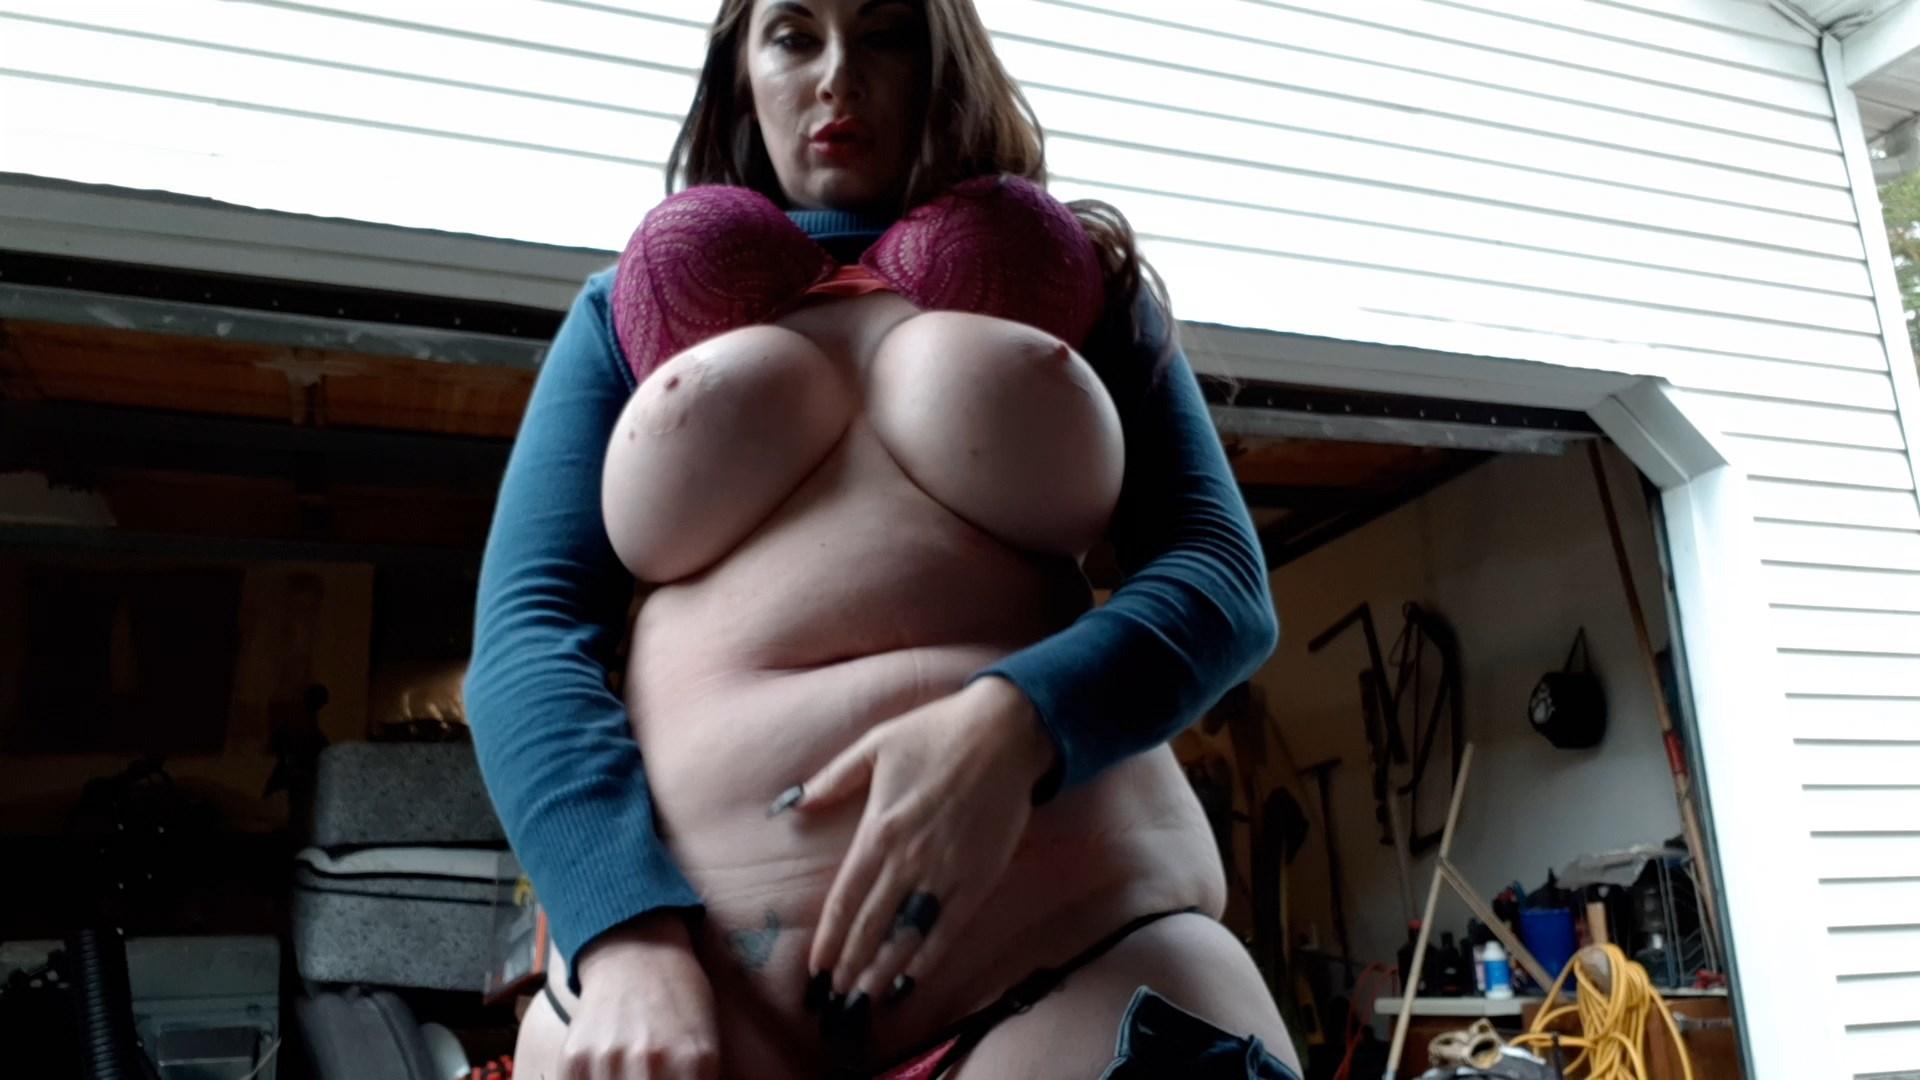 Mizz Erotique - Giving My Moms Neighbors A loud cum Show